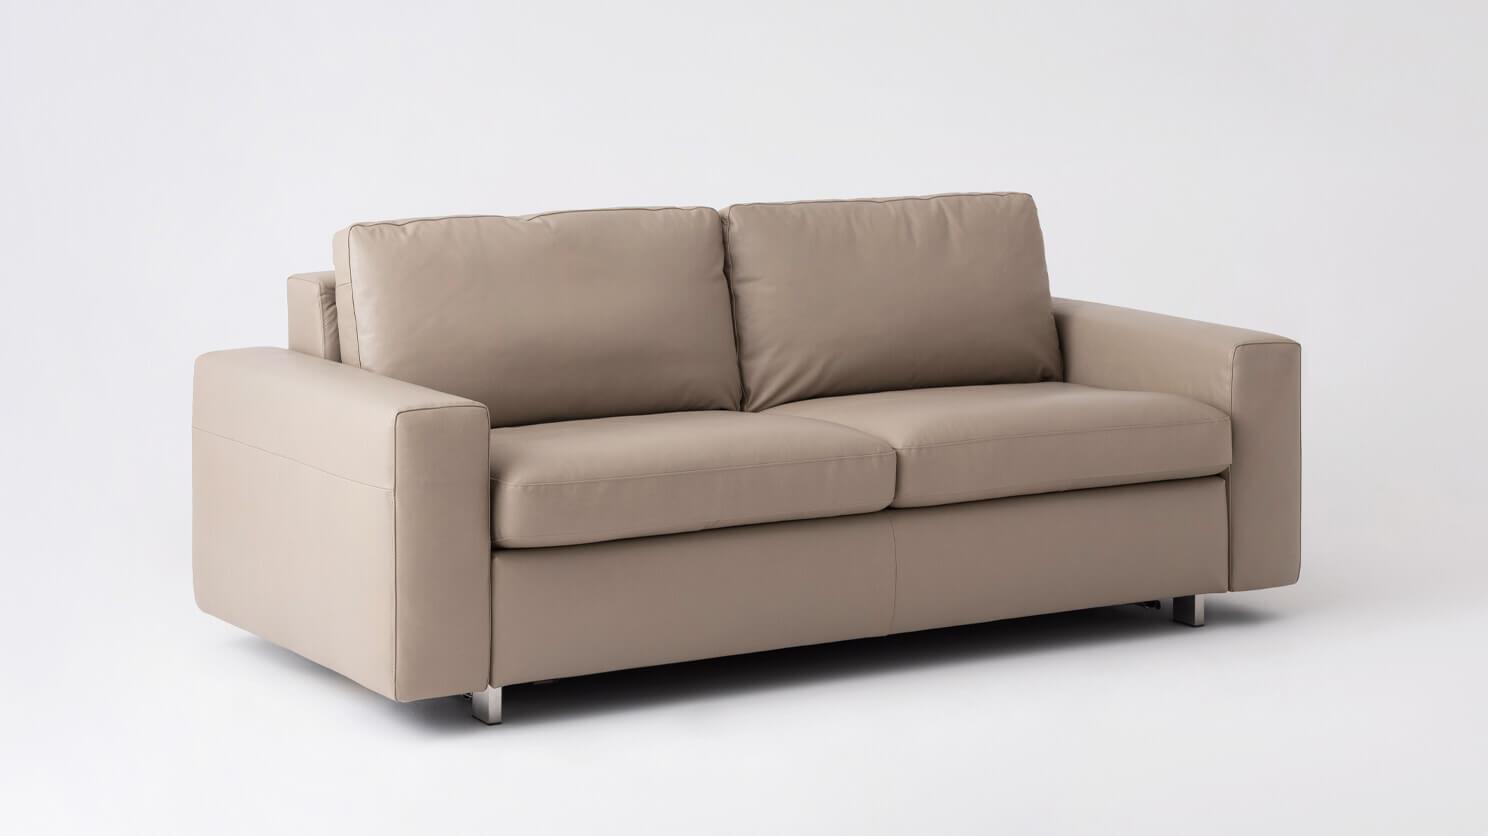 Reva Sofa Bed Full Size Mattress